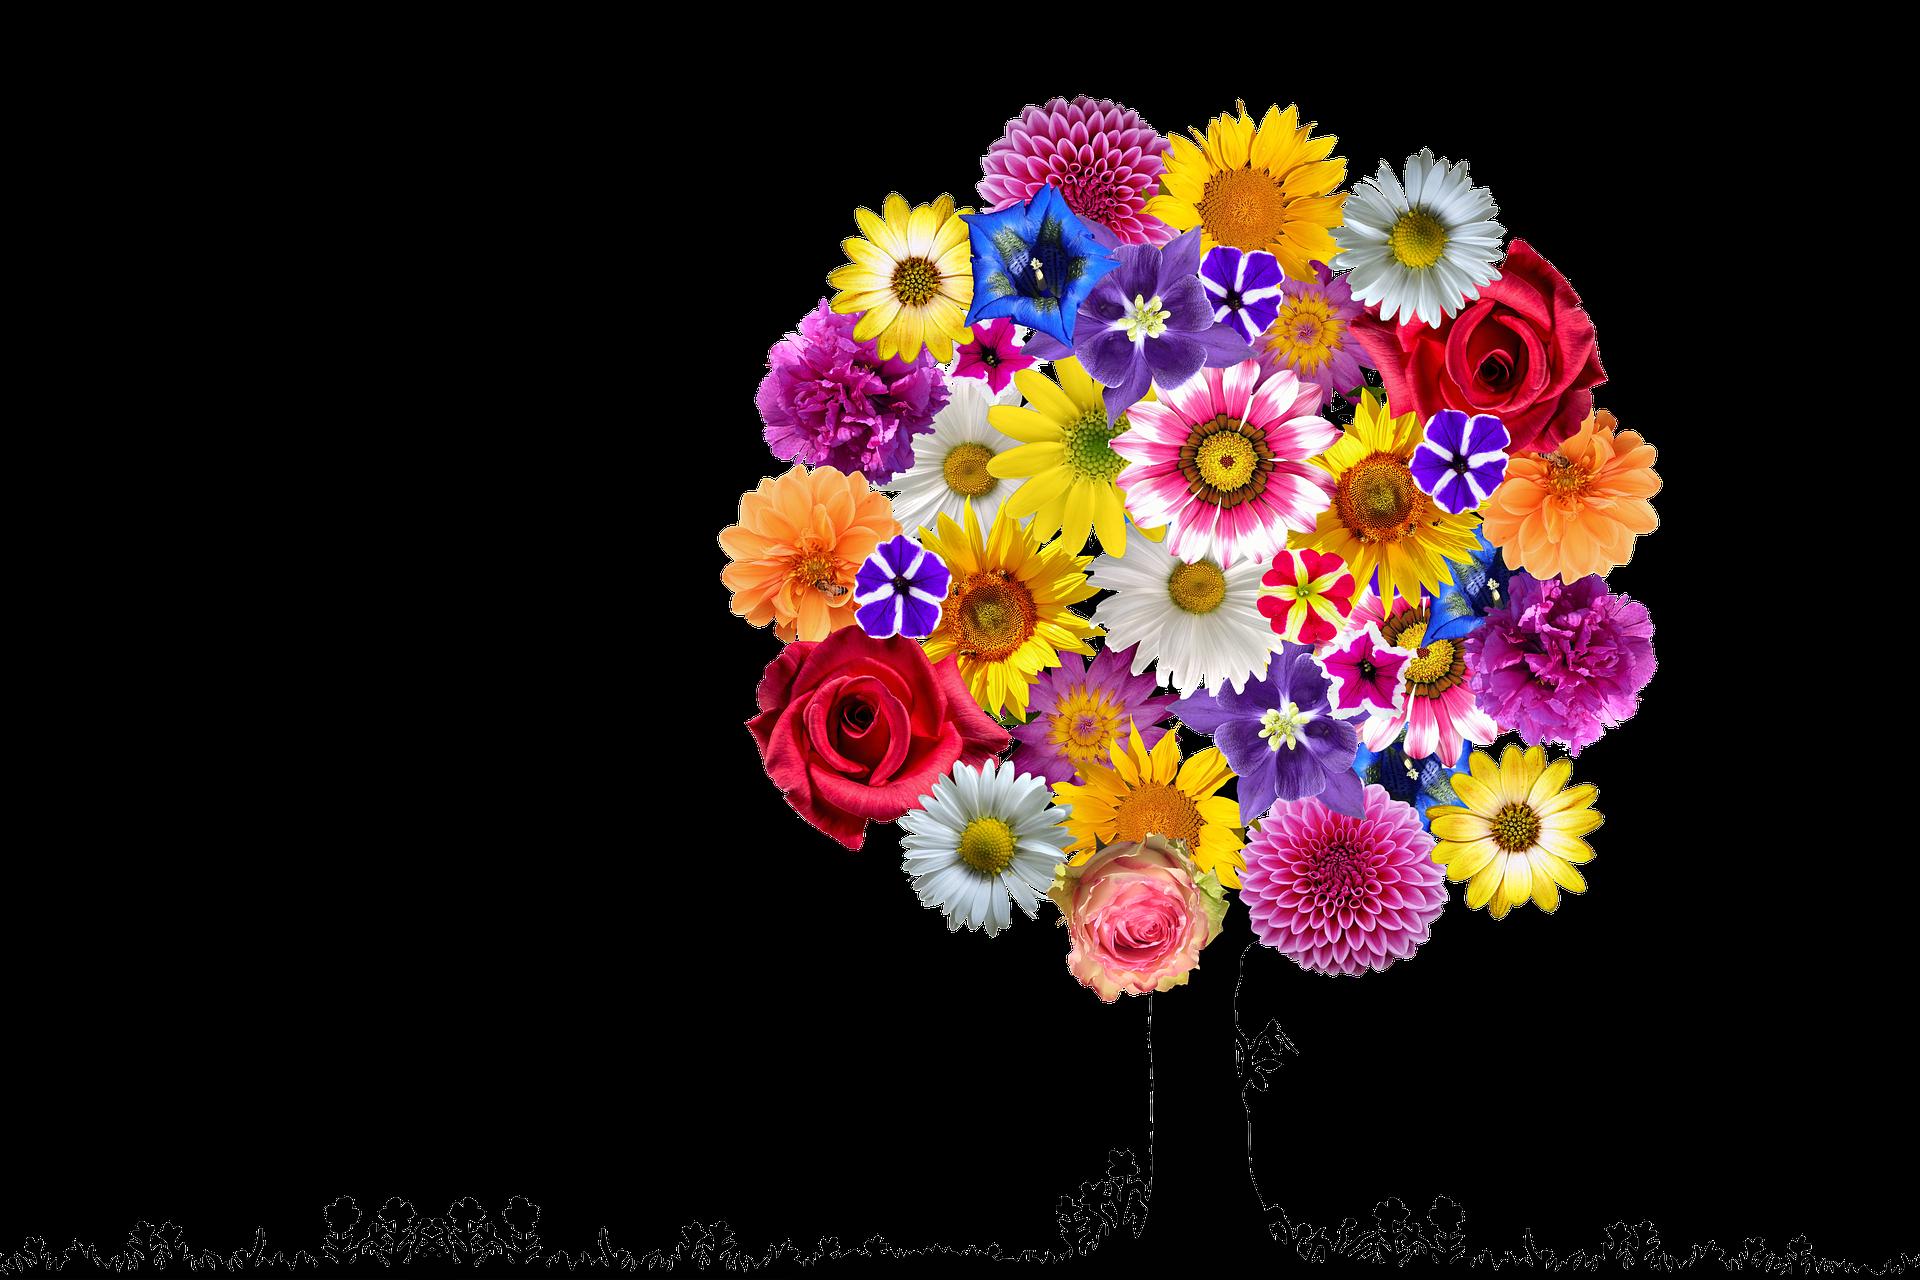 flowers-2731337_1920